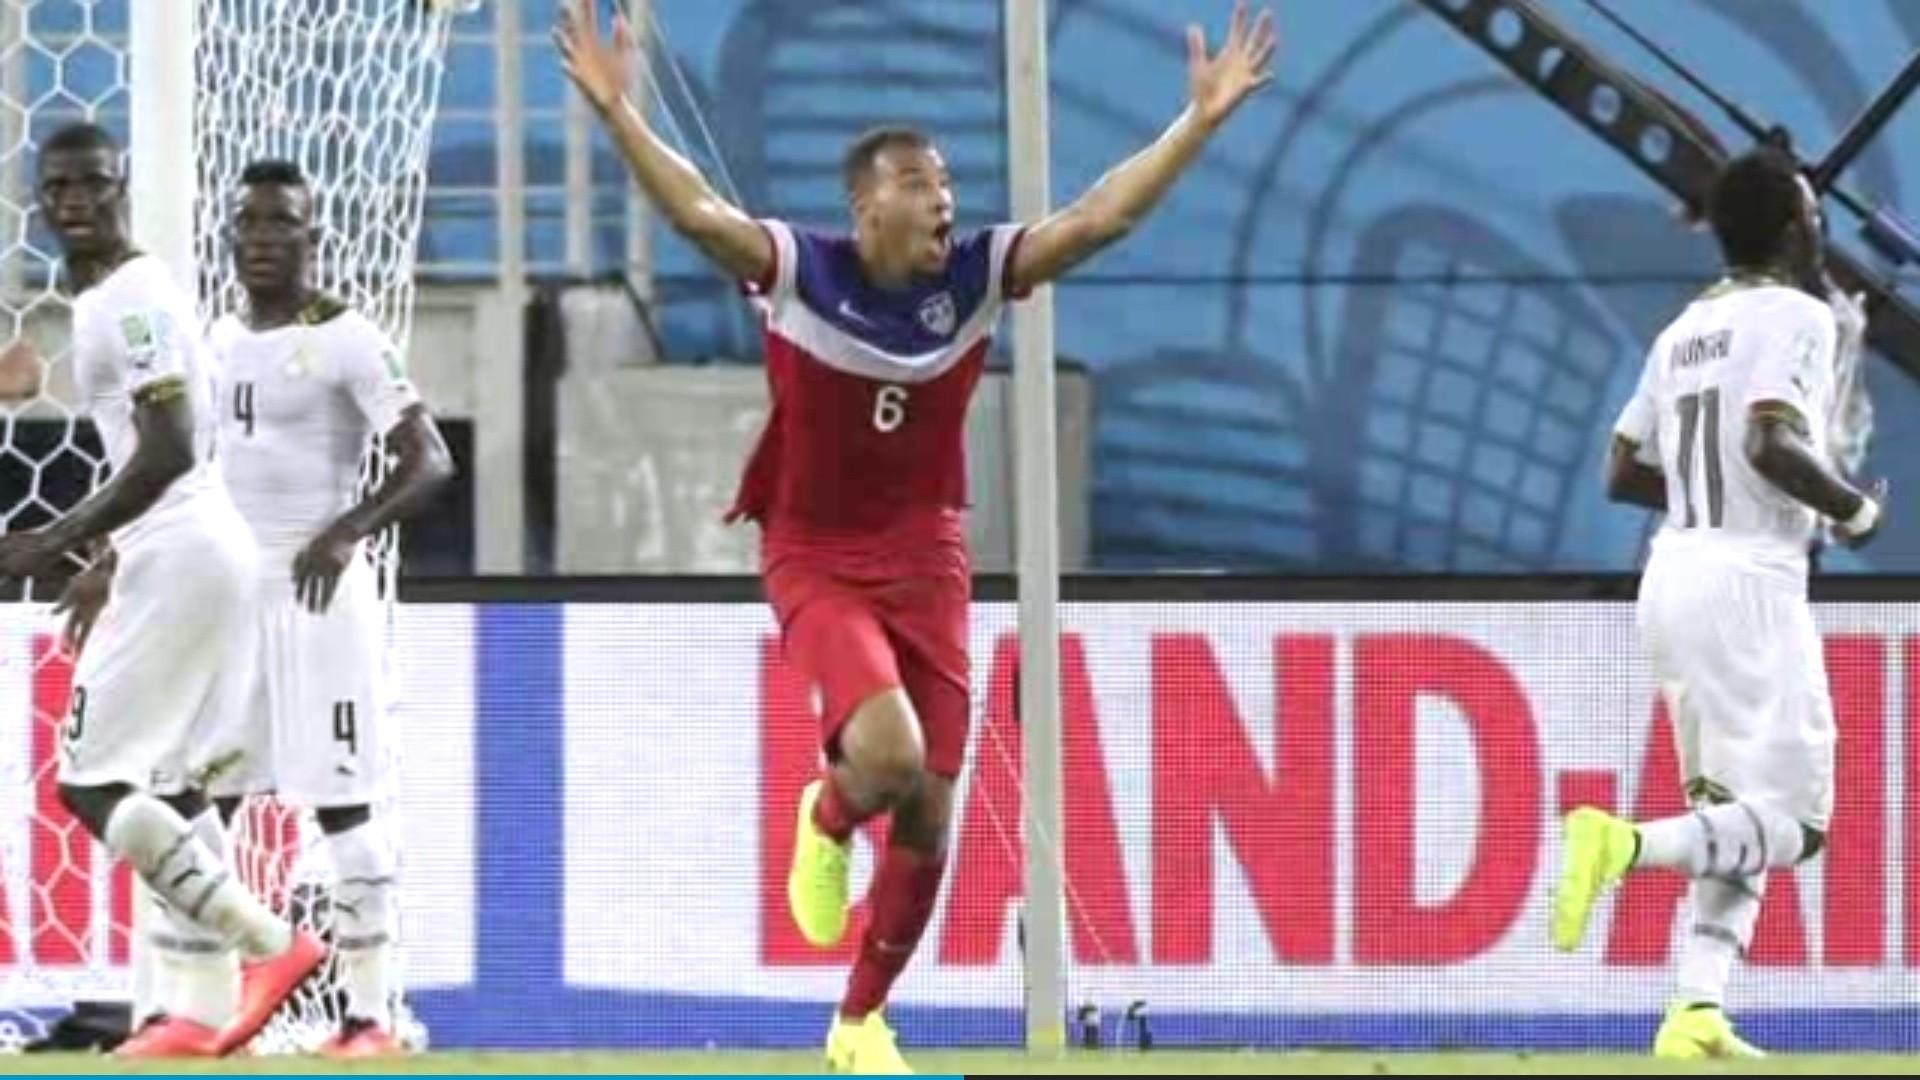 U.S. beats Ghana, but win is costly